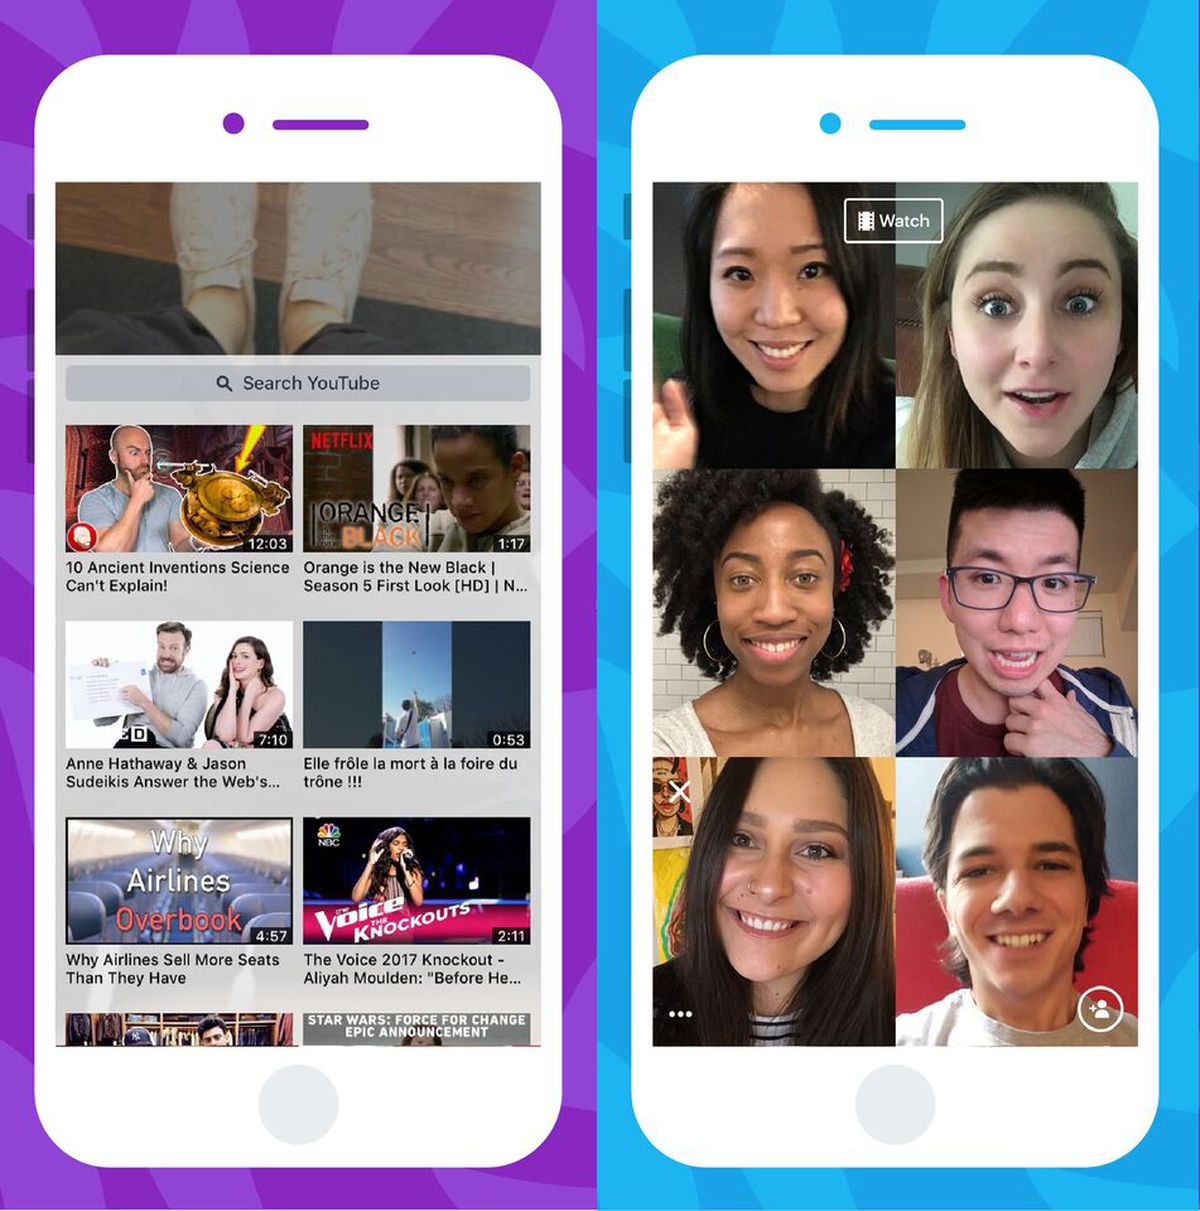 friend-youtube-teen-chatroom